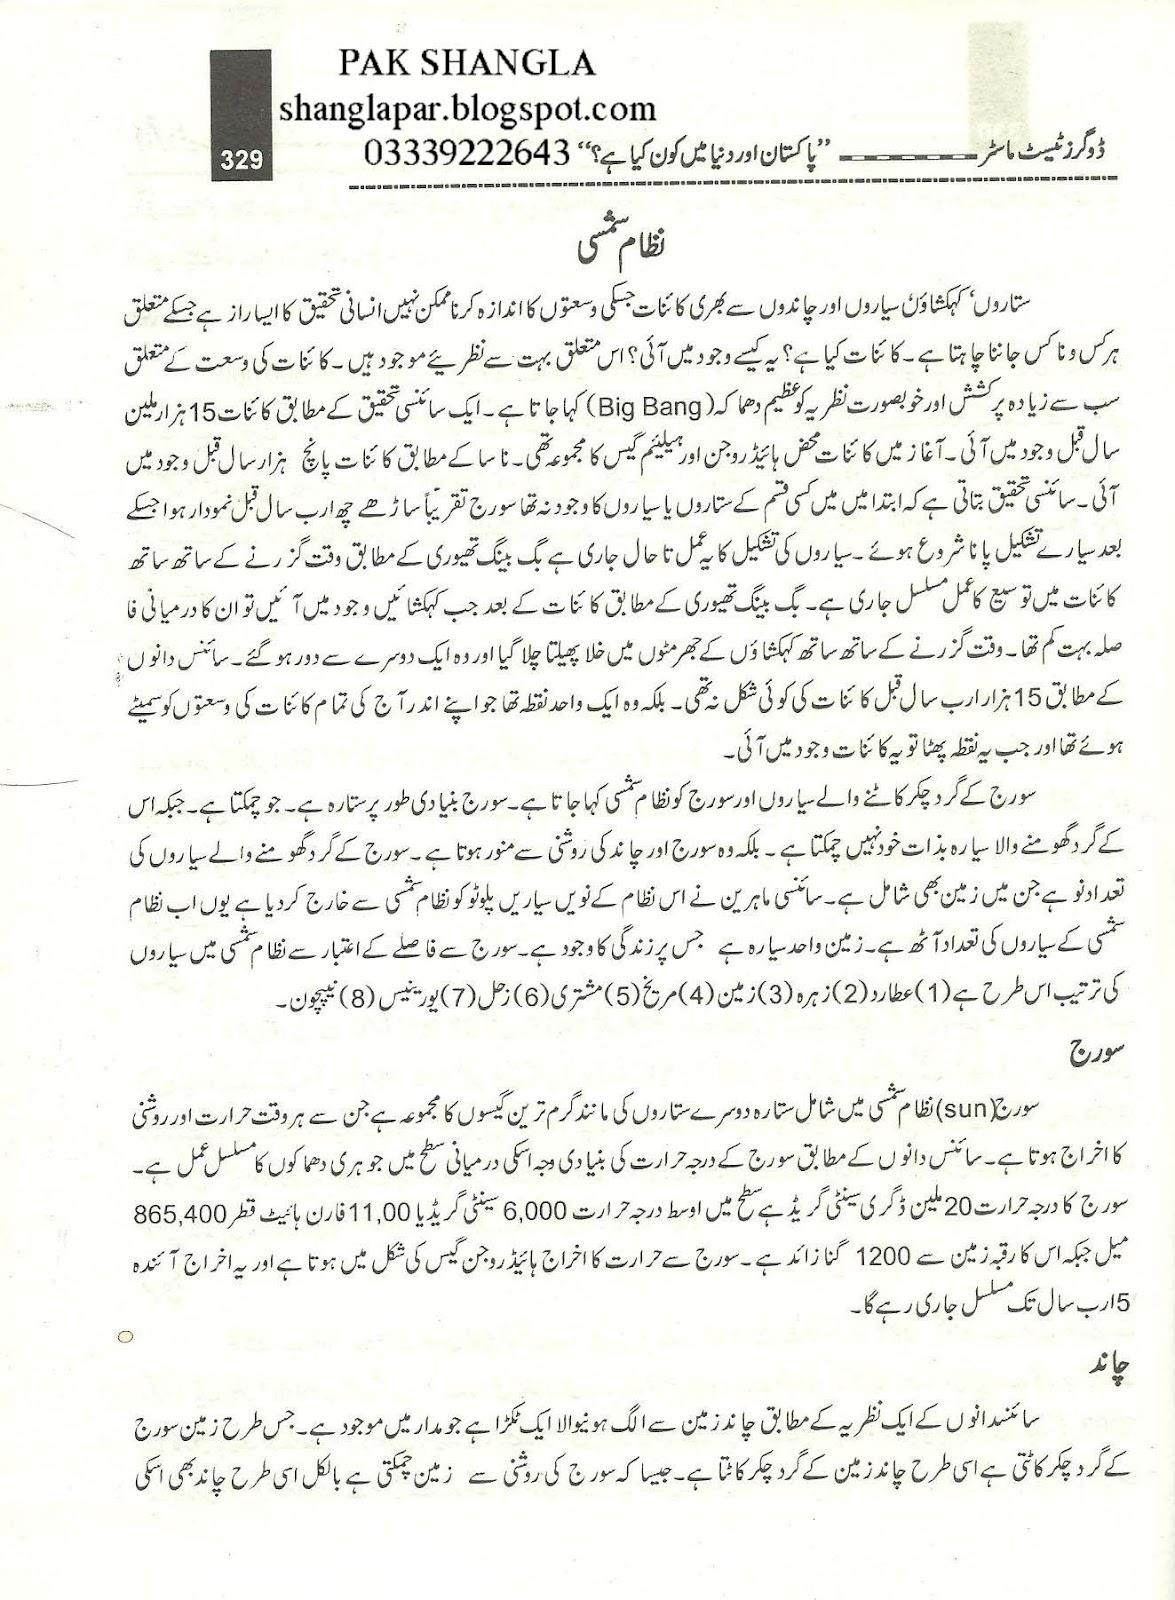 voice of yousafzai pyara solar system nizami shamsi solar system nizami shamsi general knowledge in urdu 329 to 331